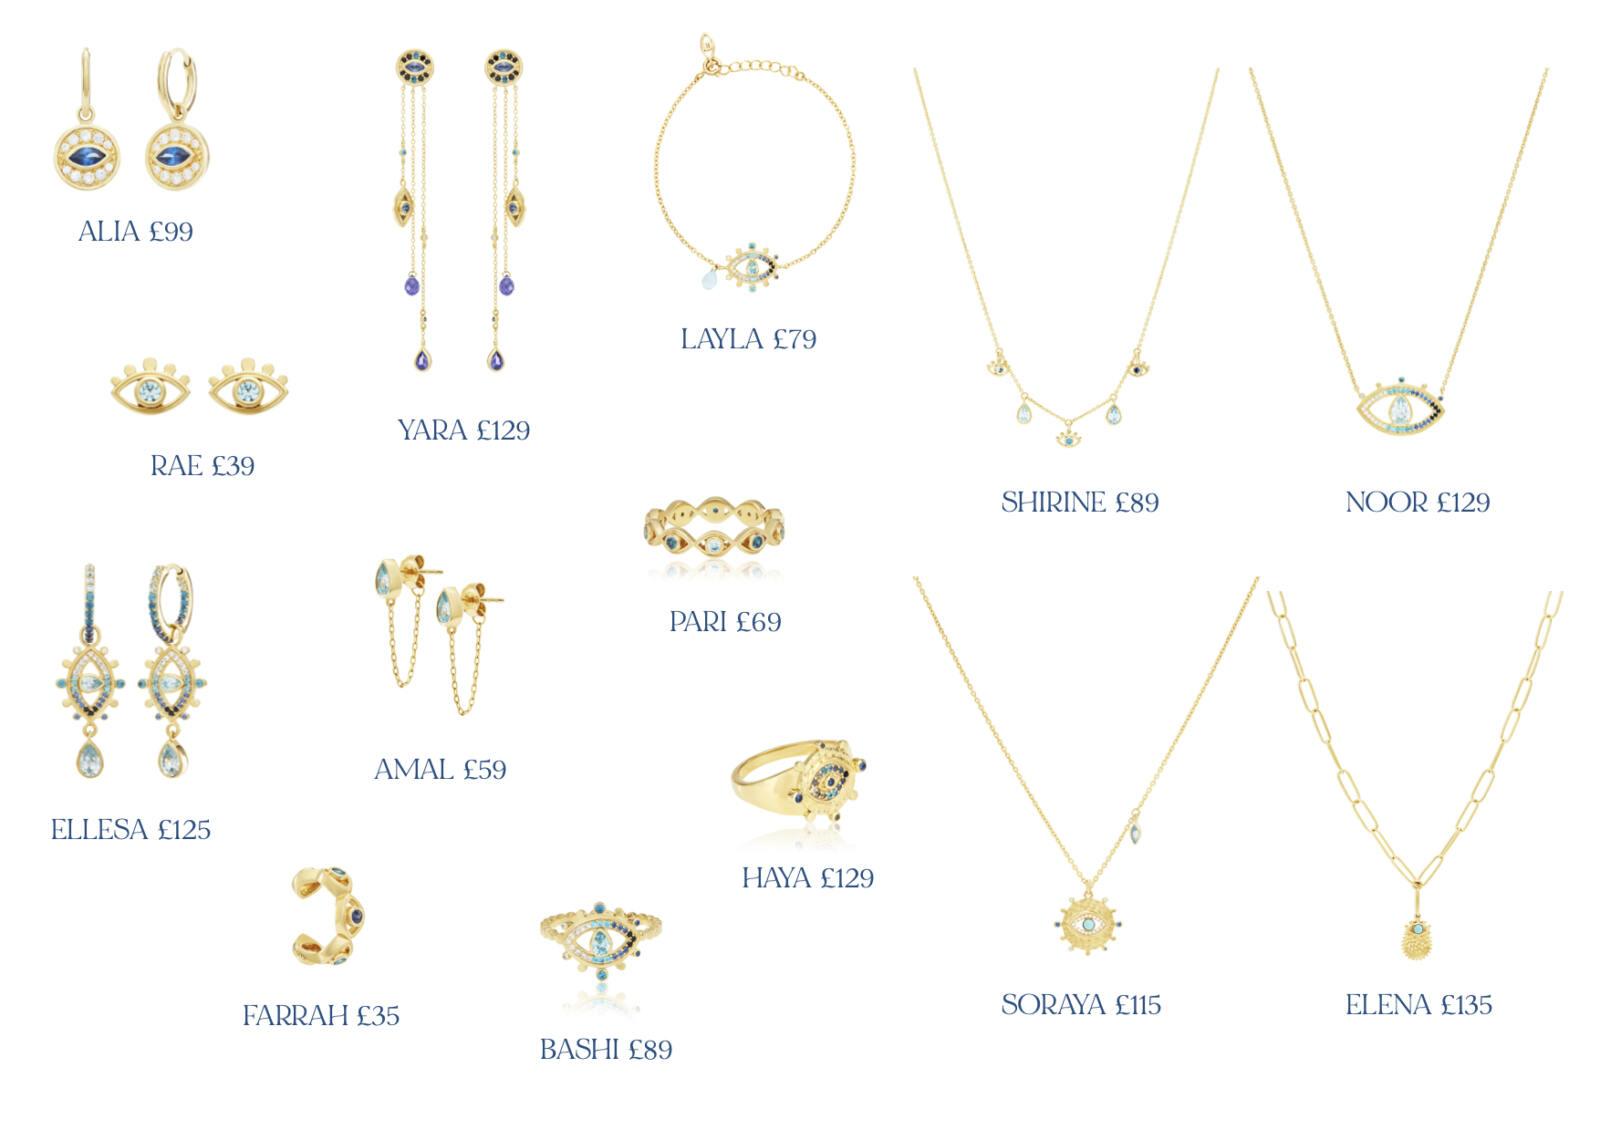 raemi products